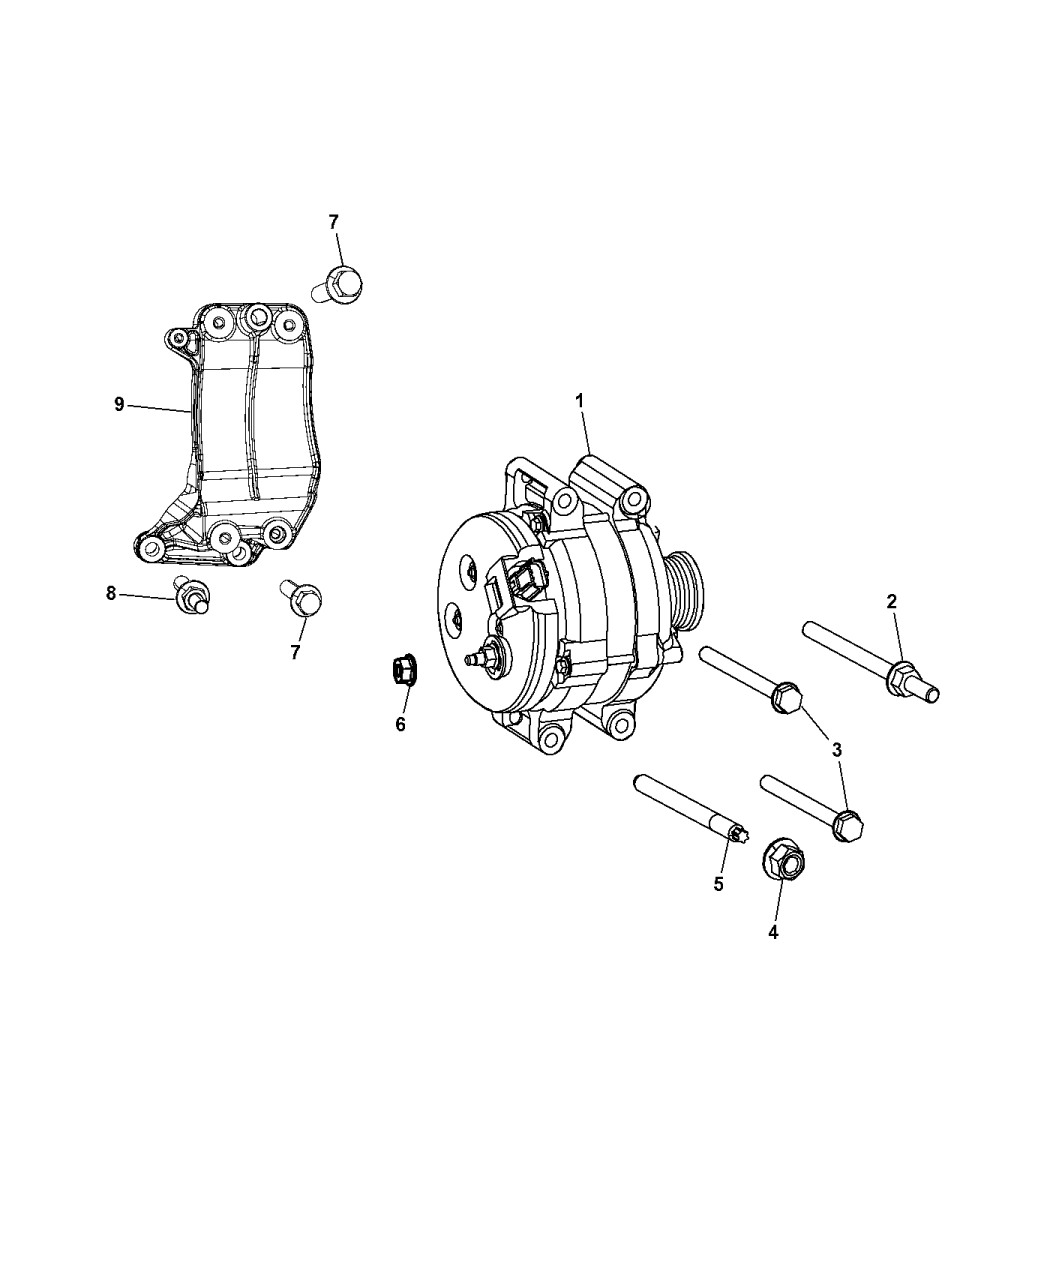 2013 Jeep Grand Cherokee Generator Alternator Related Parts